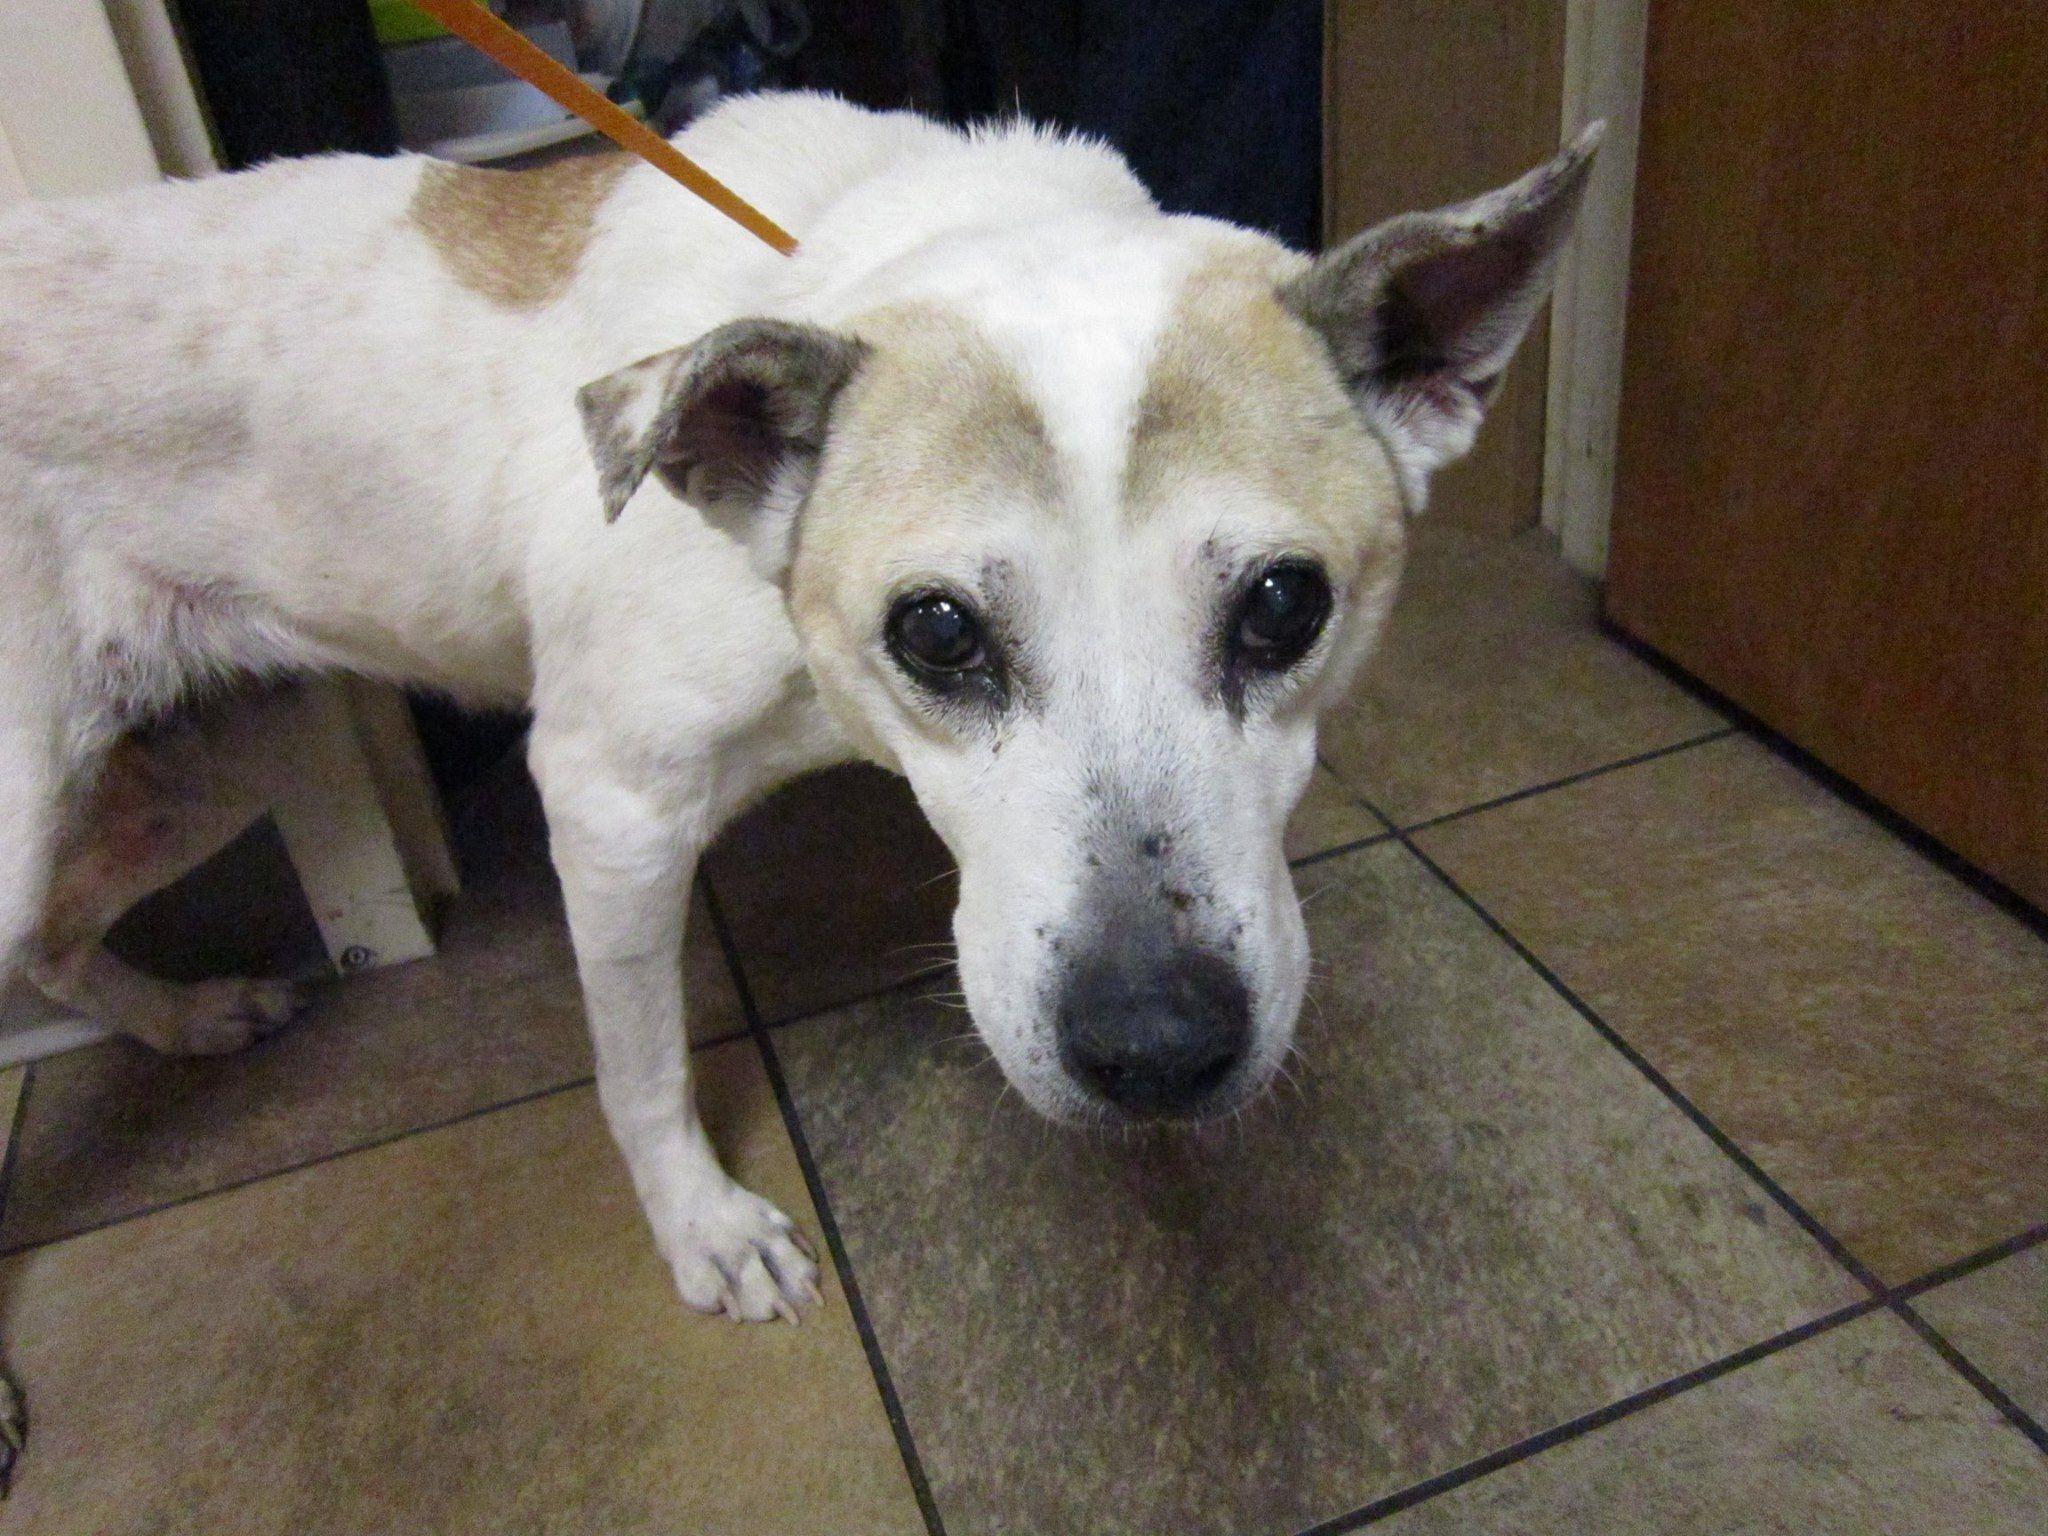 Middletown Animal Control tan white· This dog was found